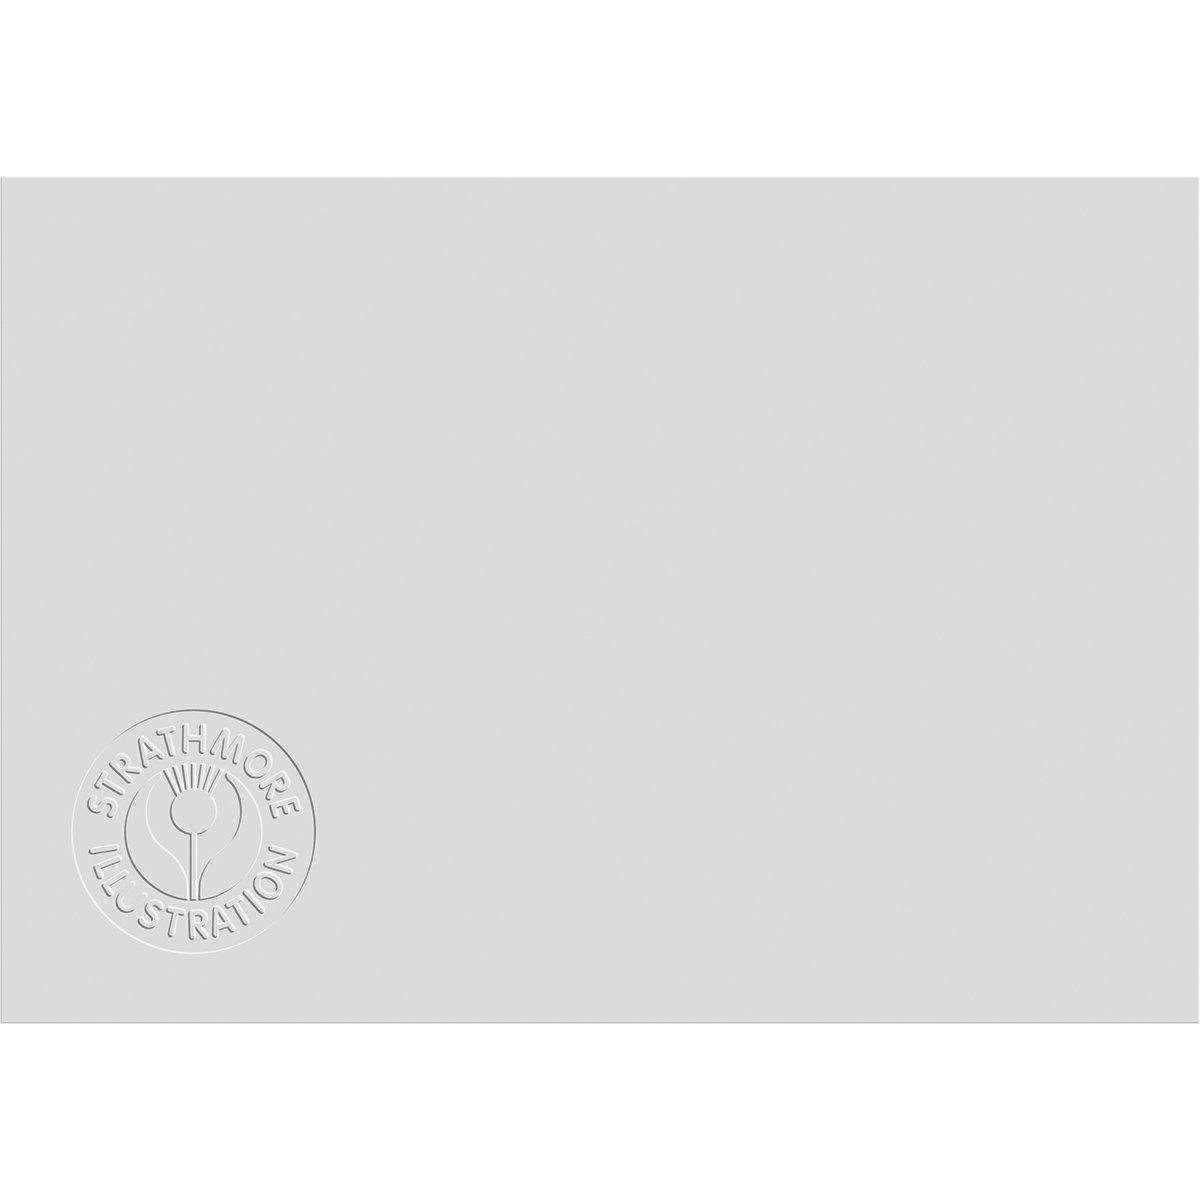 Strathmore 500 Series Illustration Board, Lightweight Vellum Surface 15 Sheets (240-13)